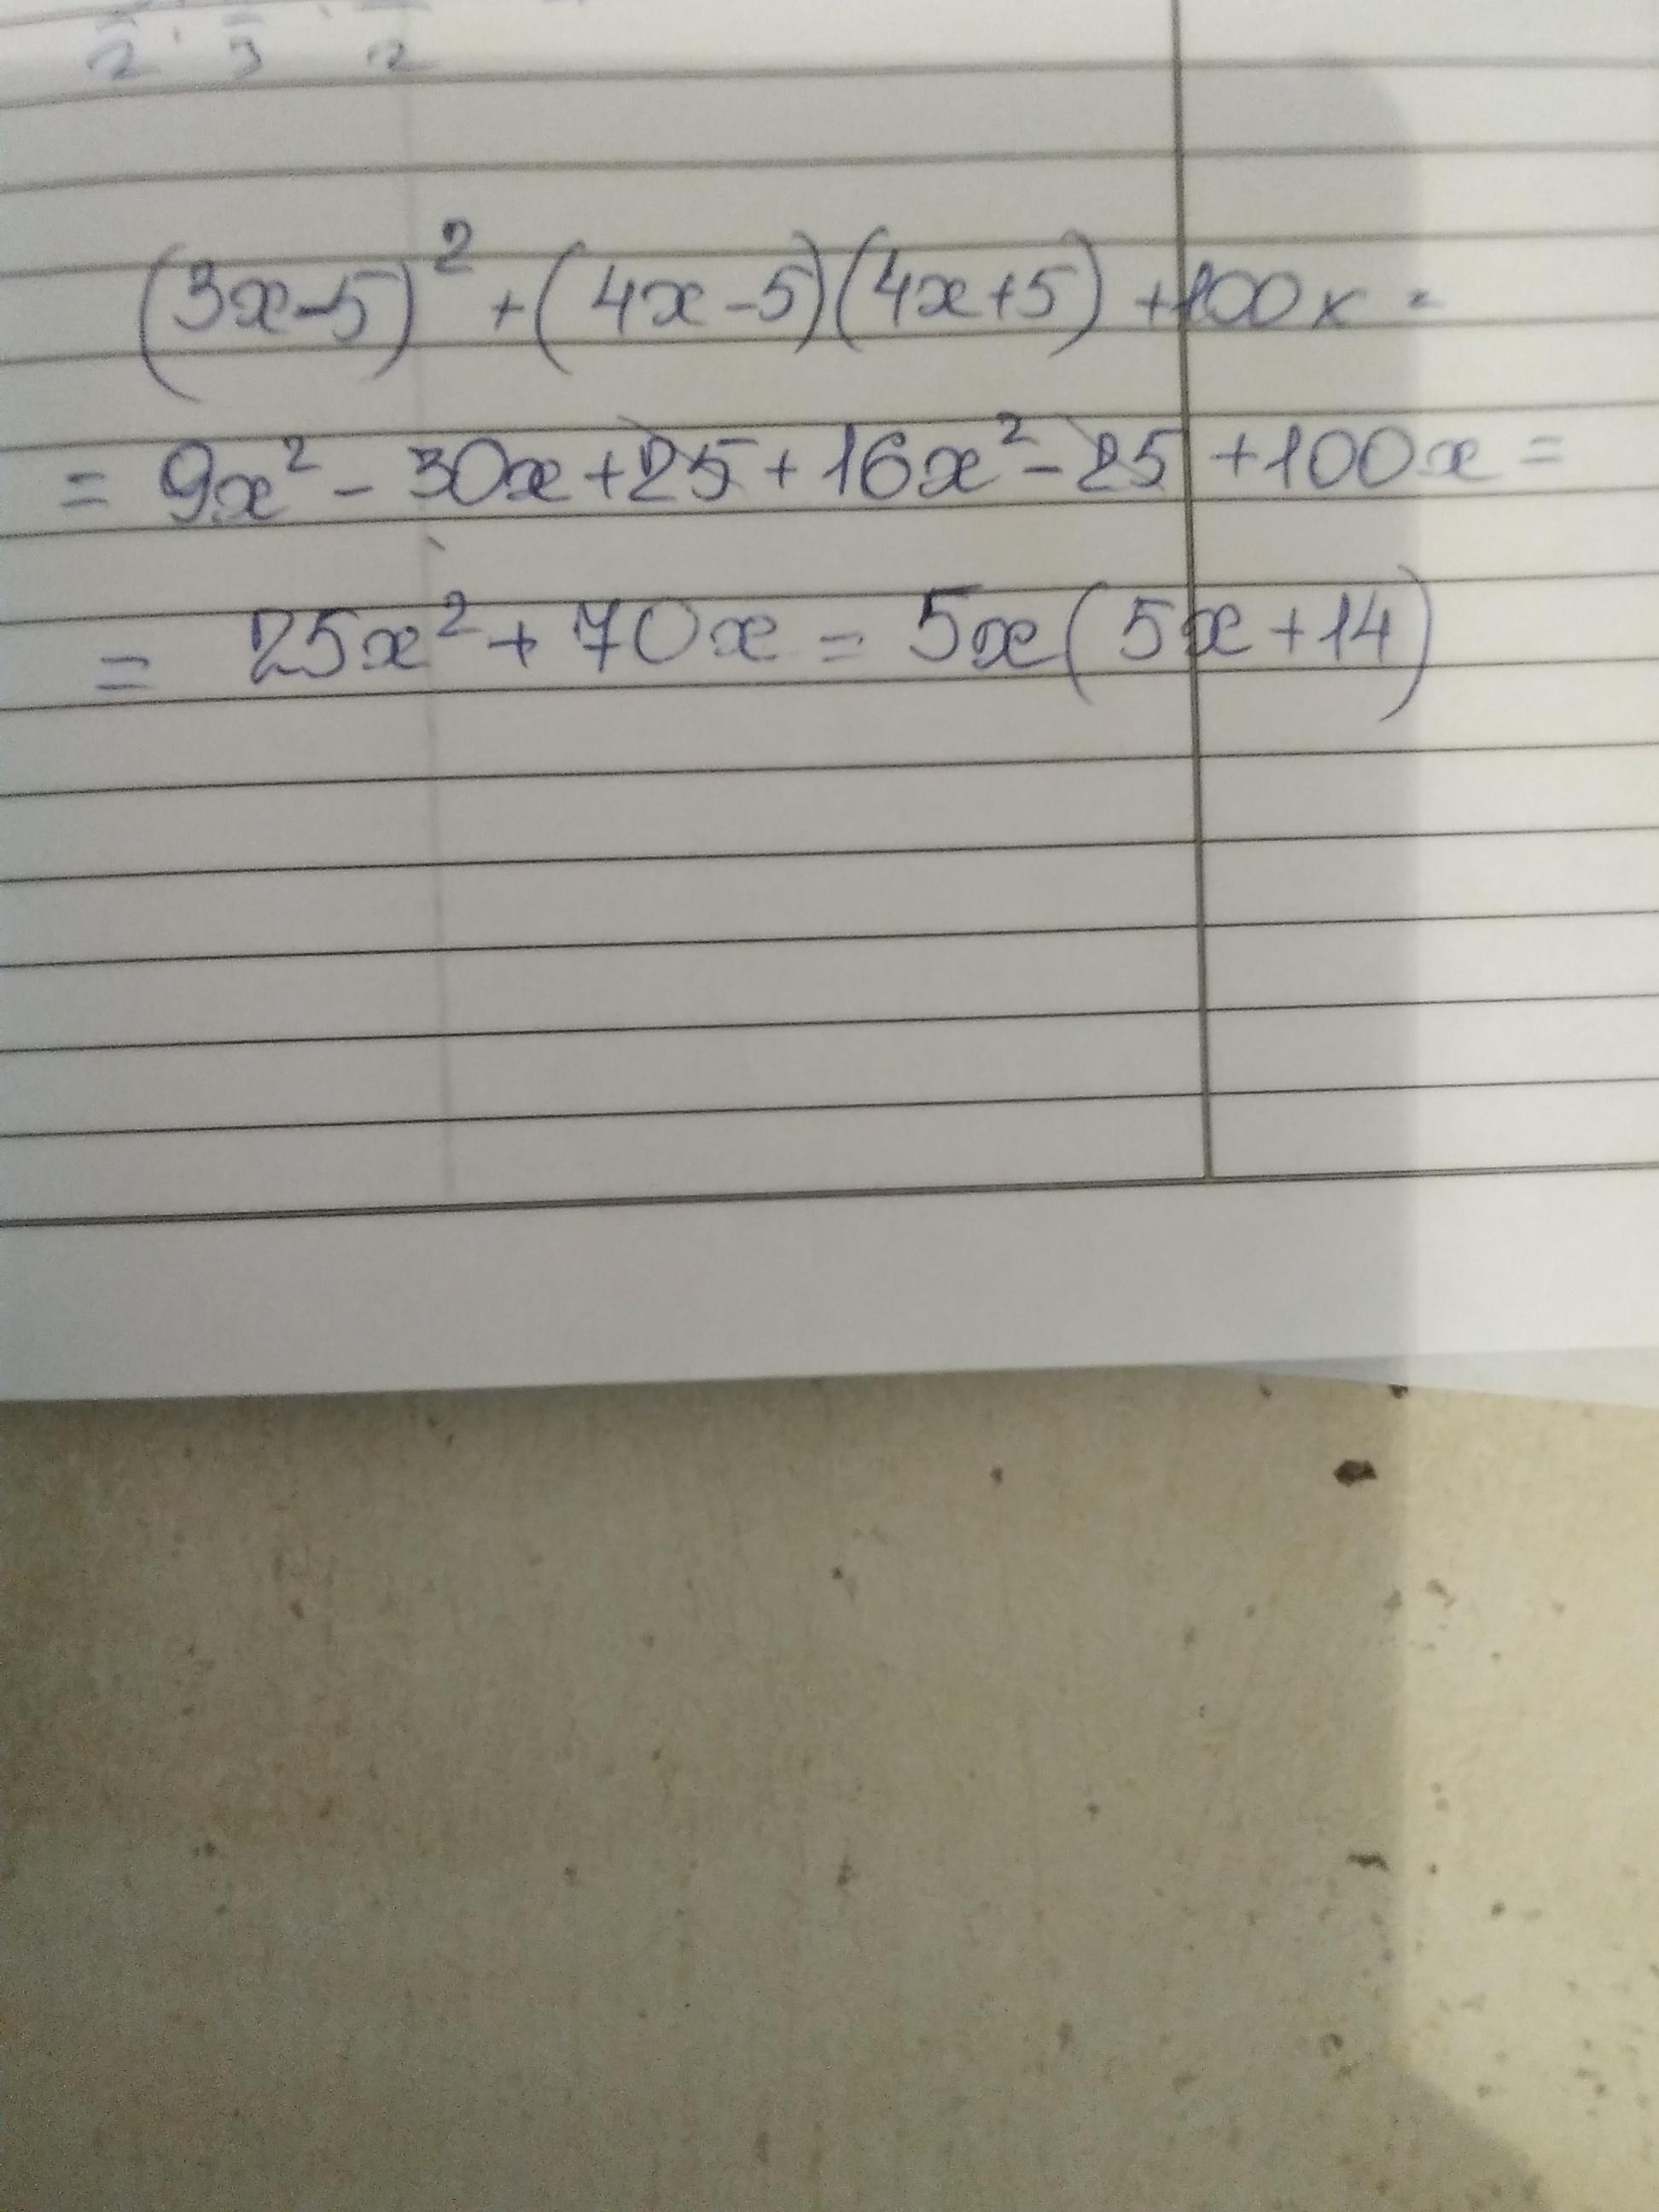 Упростите выражение (3х-5)^2+(4х-5)(4х+5)+100х Даю